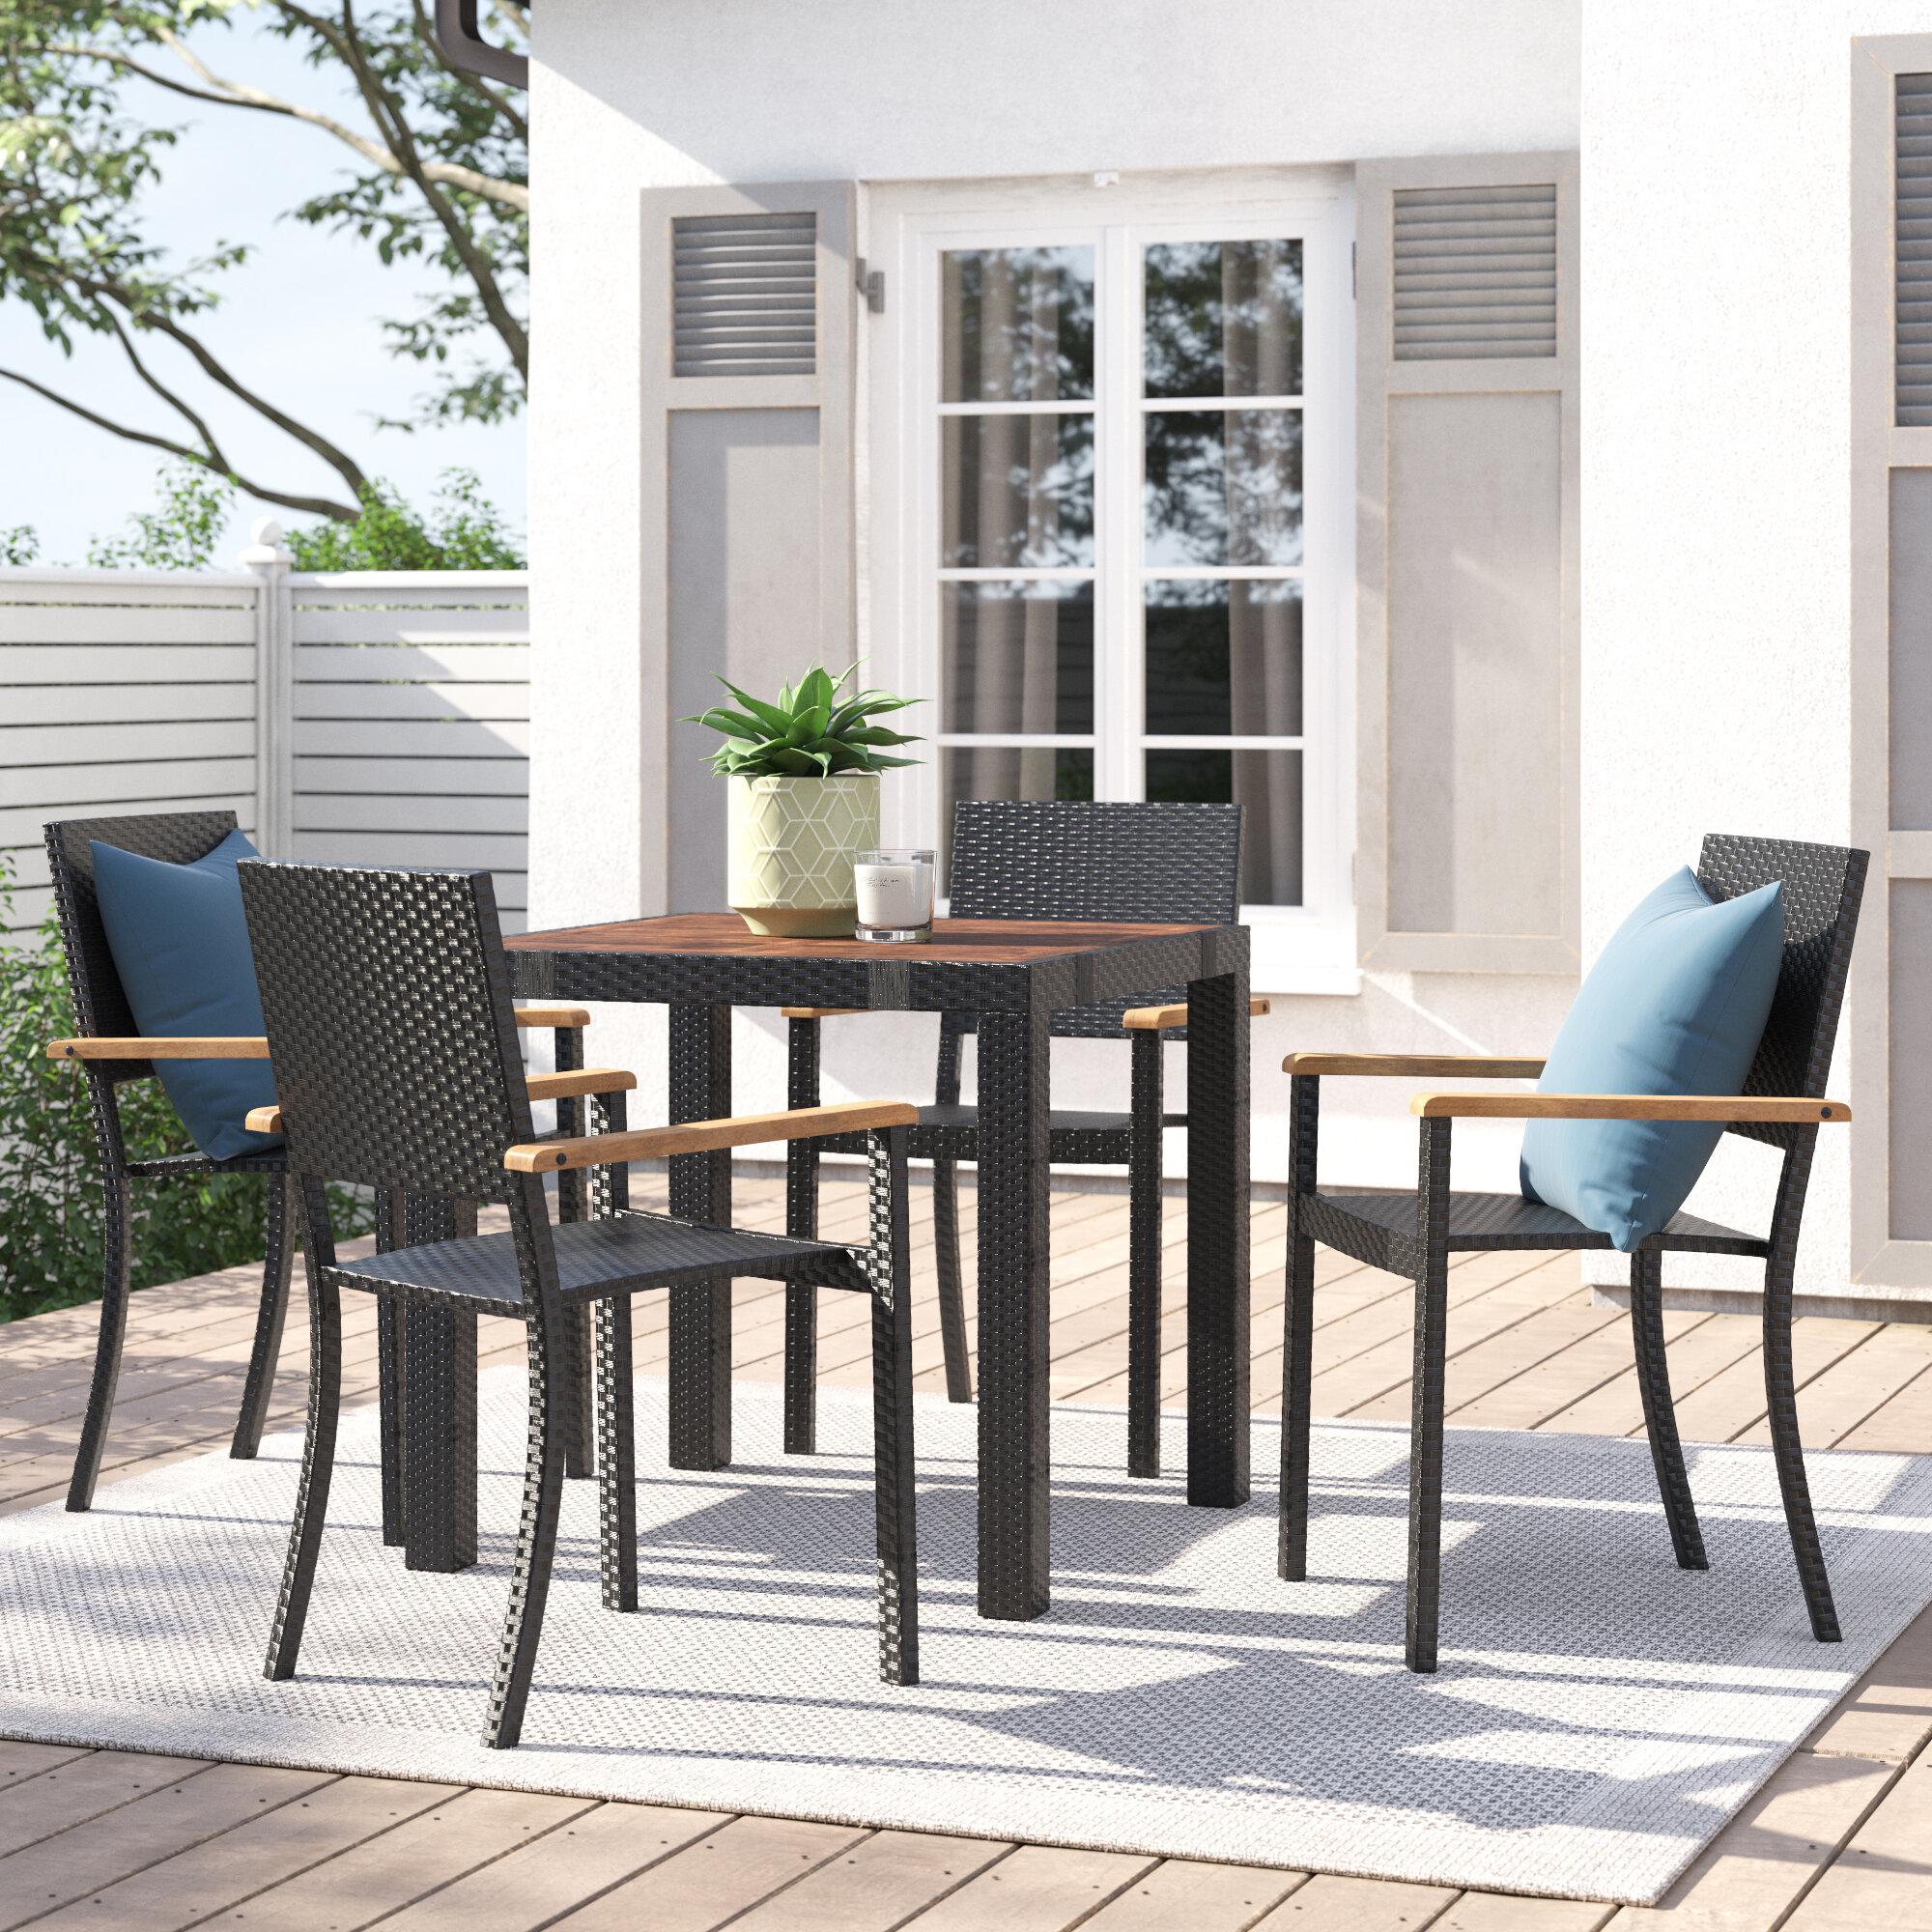 Zipcode Design Kaelyn 4 Seater Dining Set Reviews Wayfair Co Uk